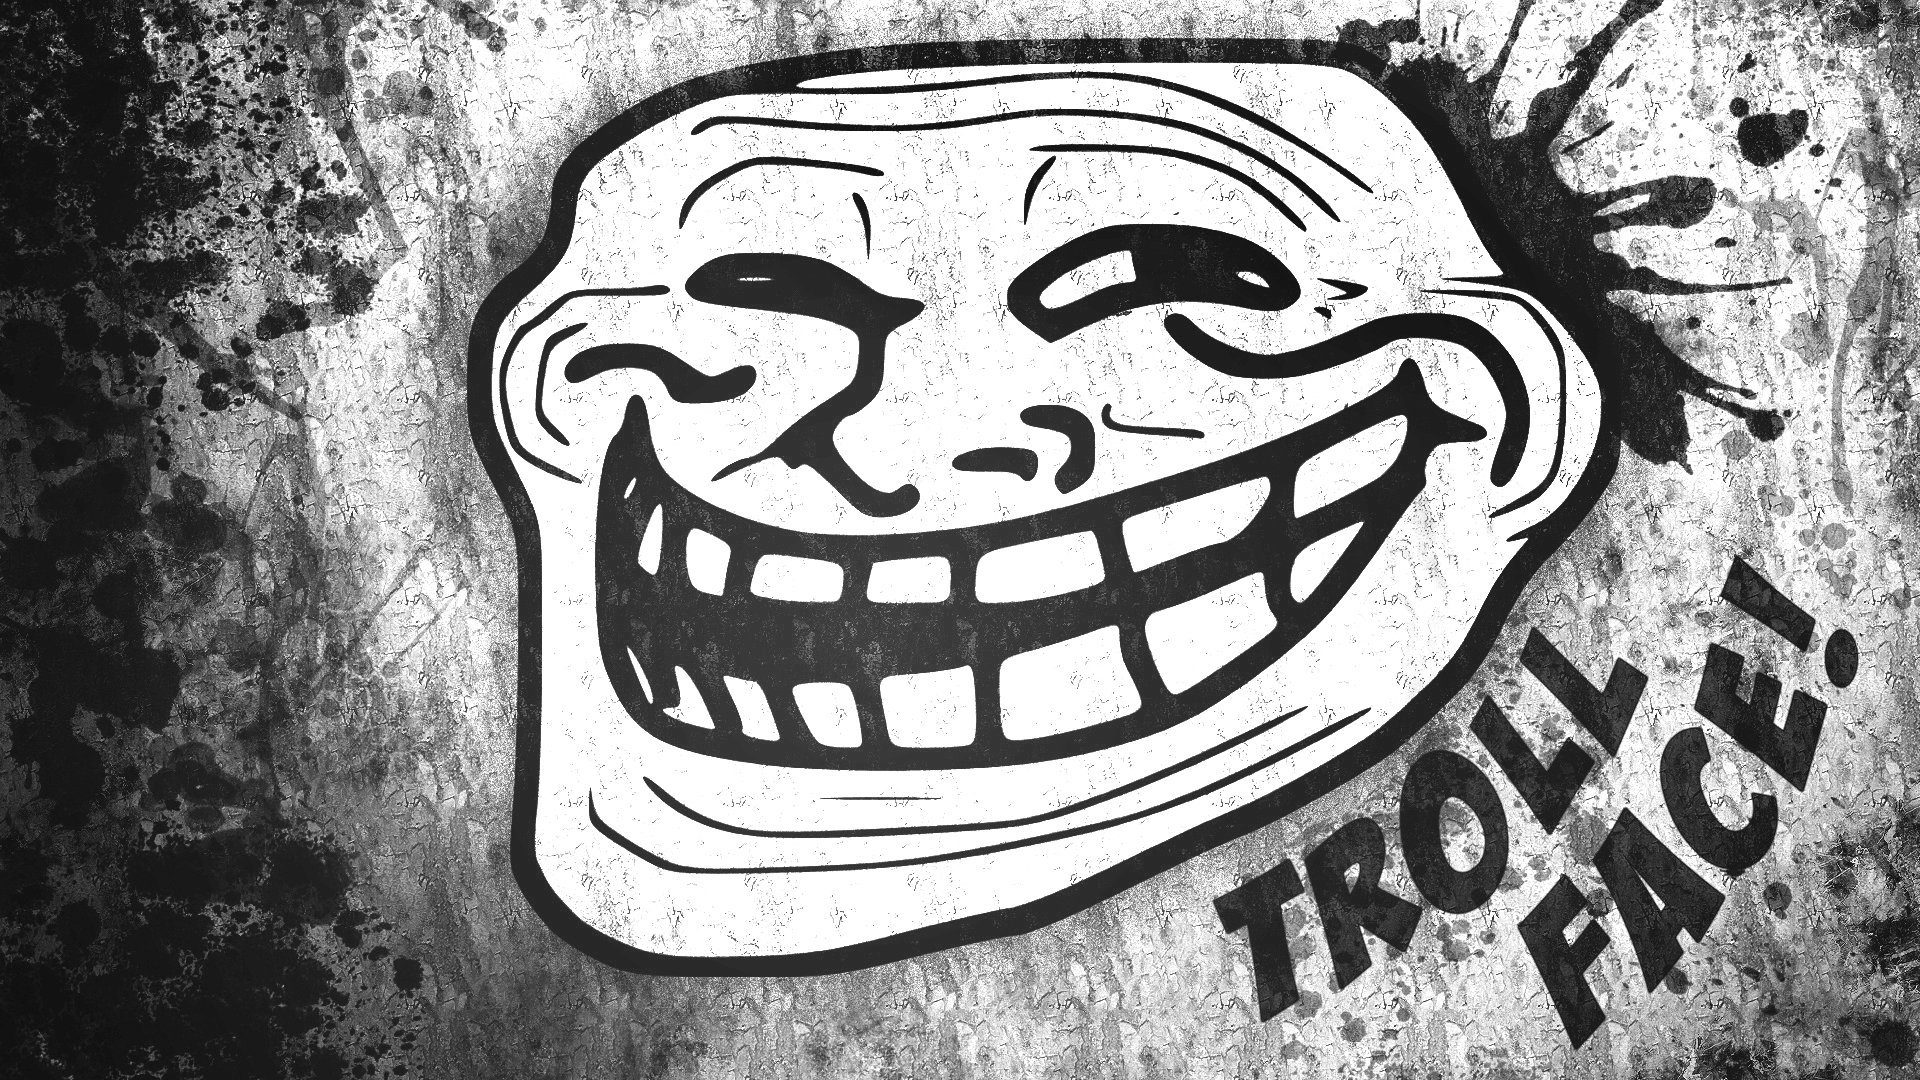 Download Troll Face Wallpaper 7648 1920x1080 px High Resolution